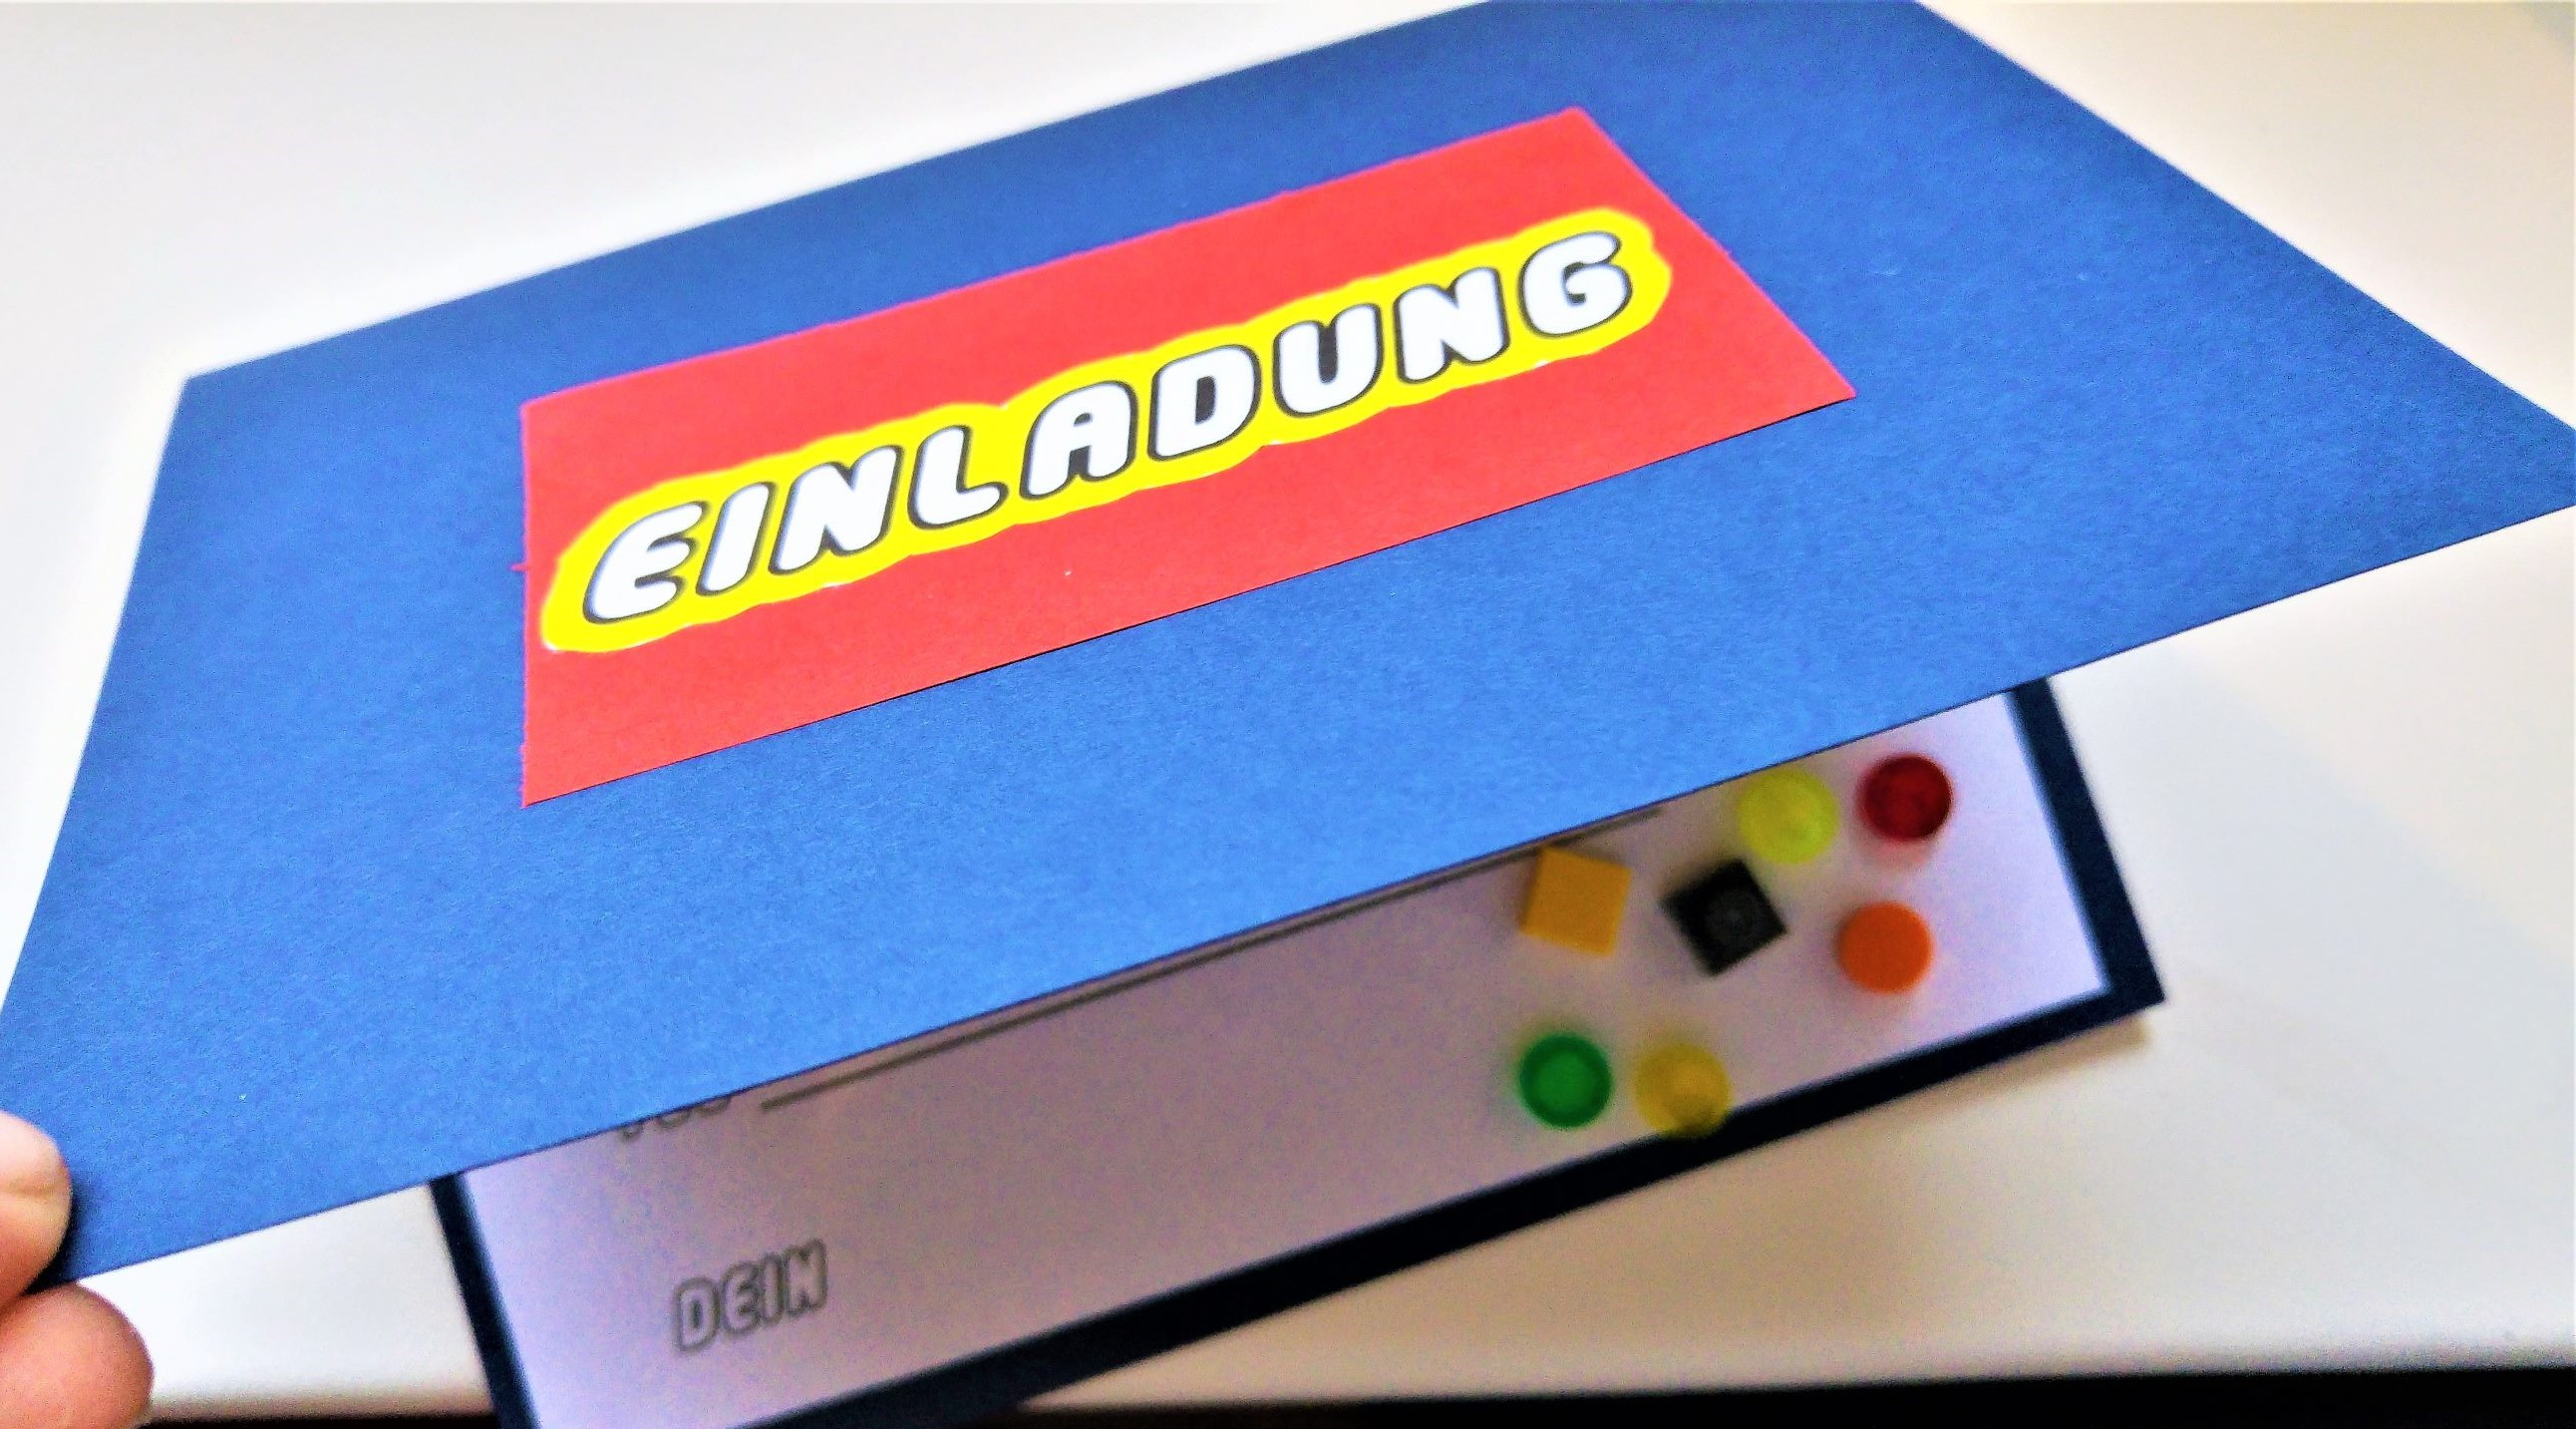 Einladung Lego-Geburtstag